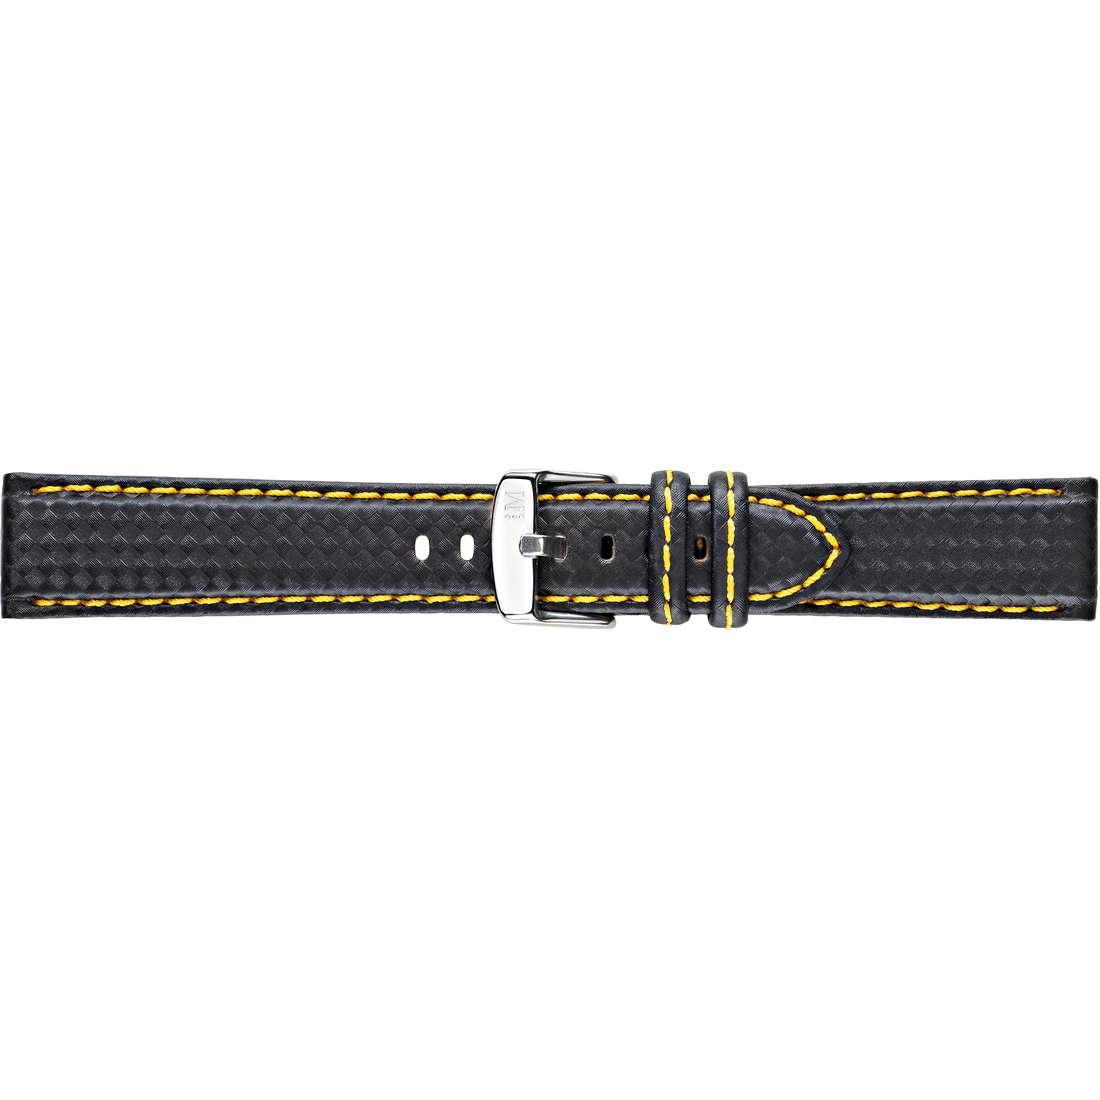 watch watch bands watch straps man Morellato Linea Sport A01U3586977897CR22